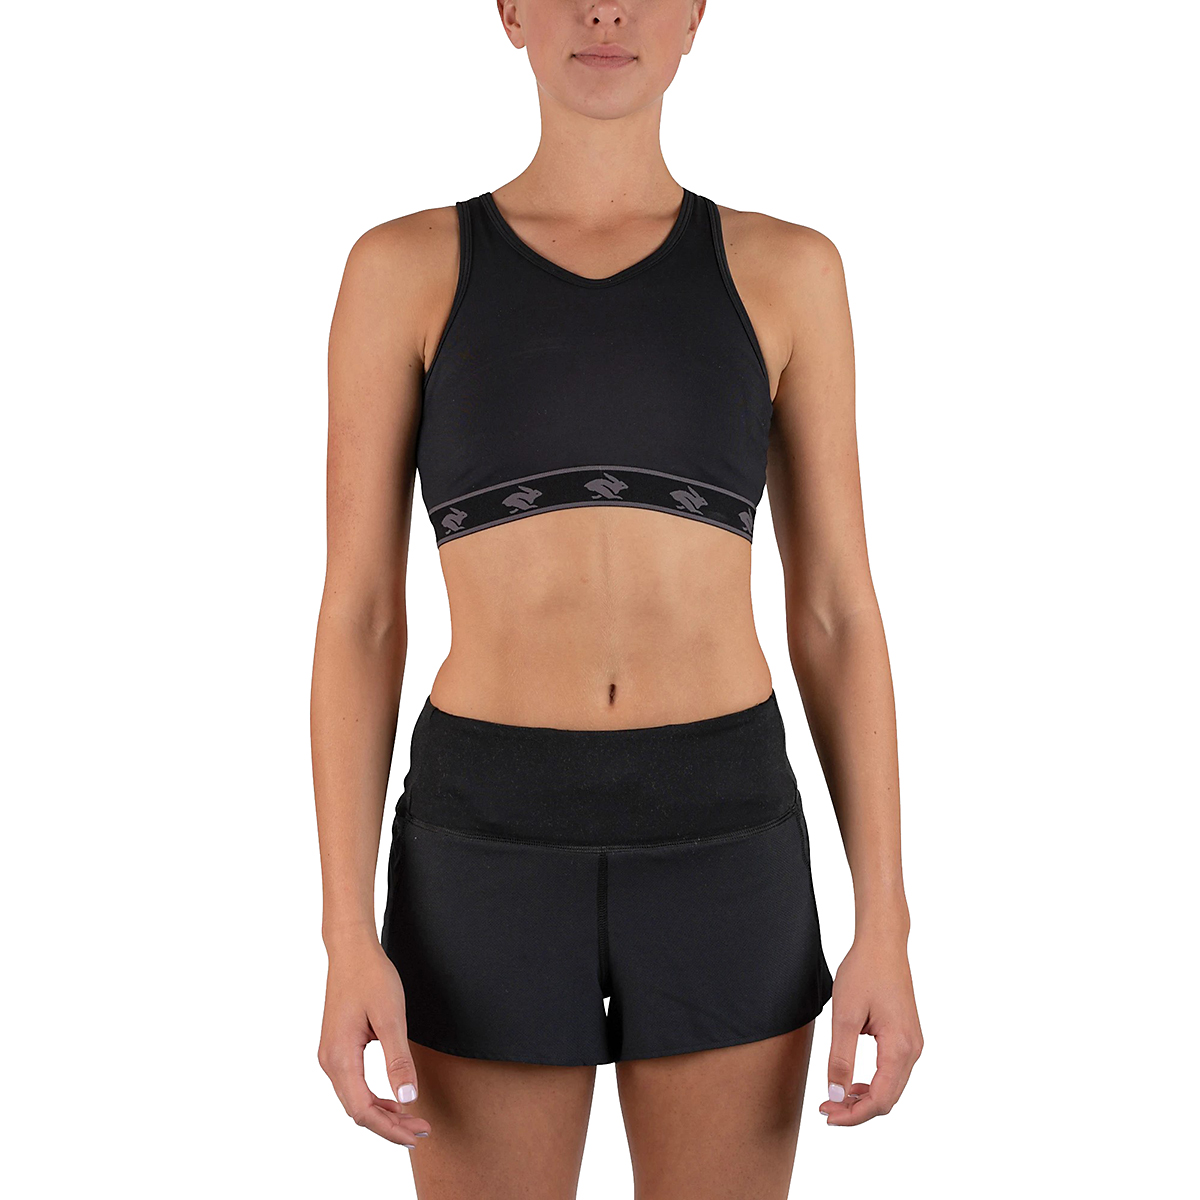 Women's Rabbit UtiliBRA-vo Sports Bra - Color: Black - Size: XS, Black, large, image 1